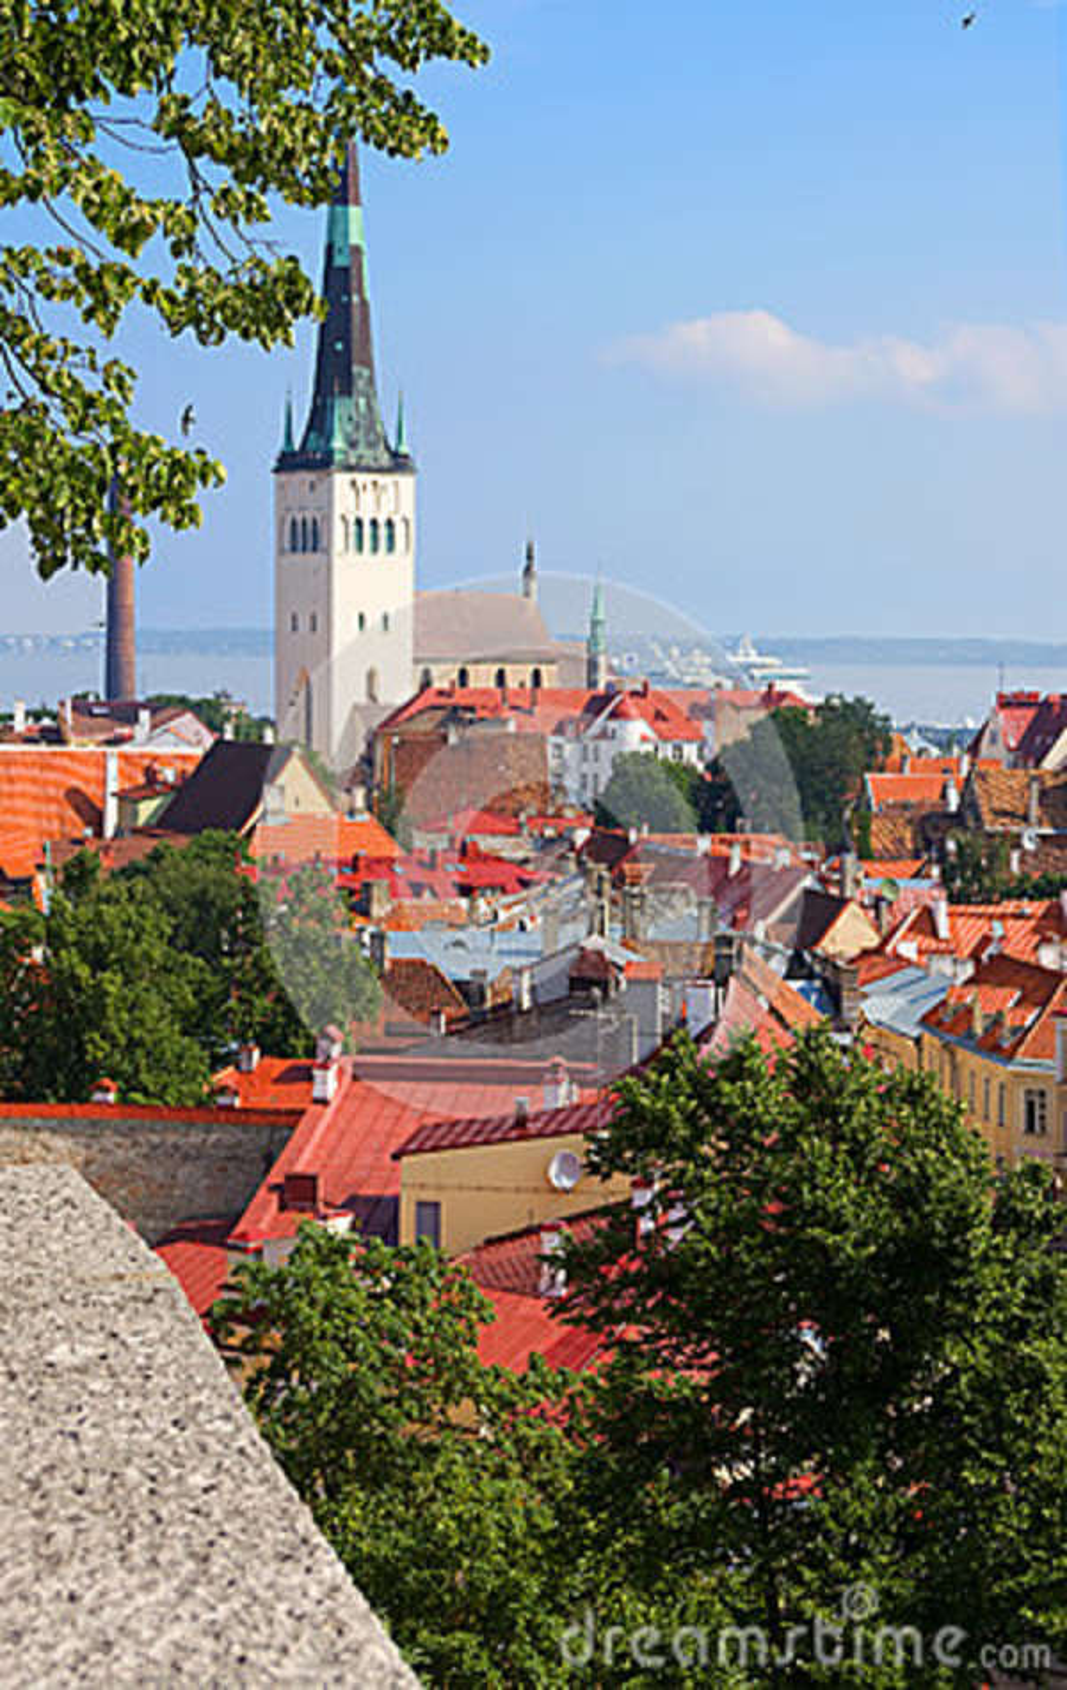 Tallinn Iglesia del Espíritu Santo